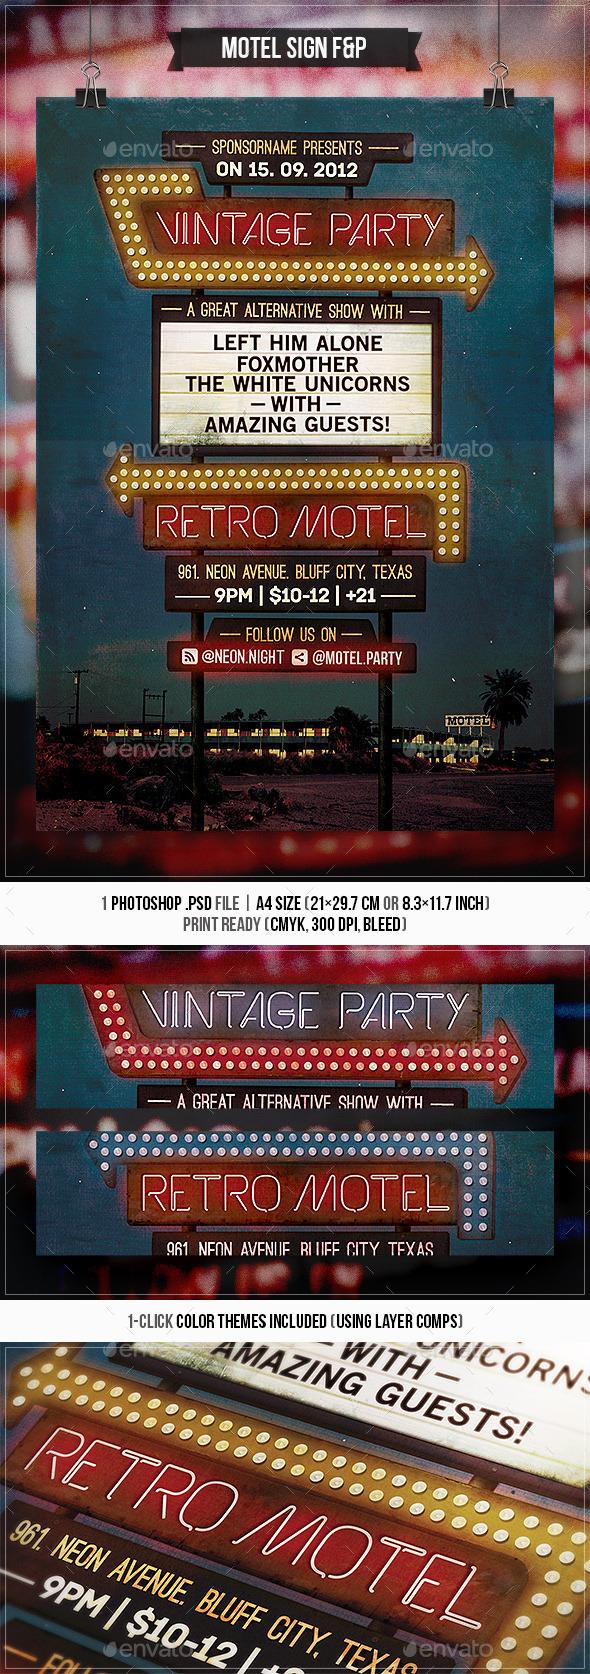 Motel Sign - Flyer & Poster - Concerts Events